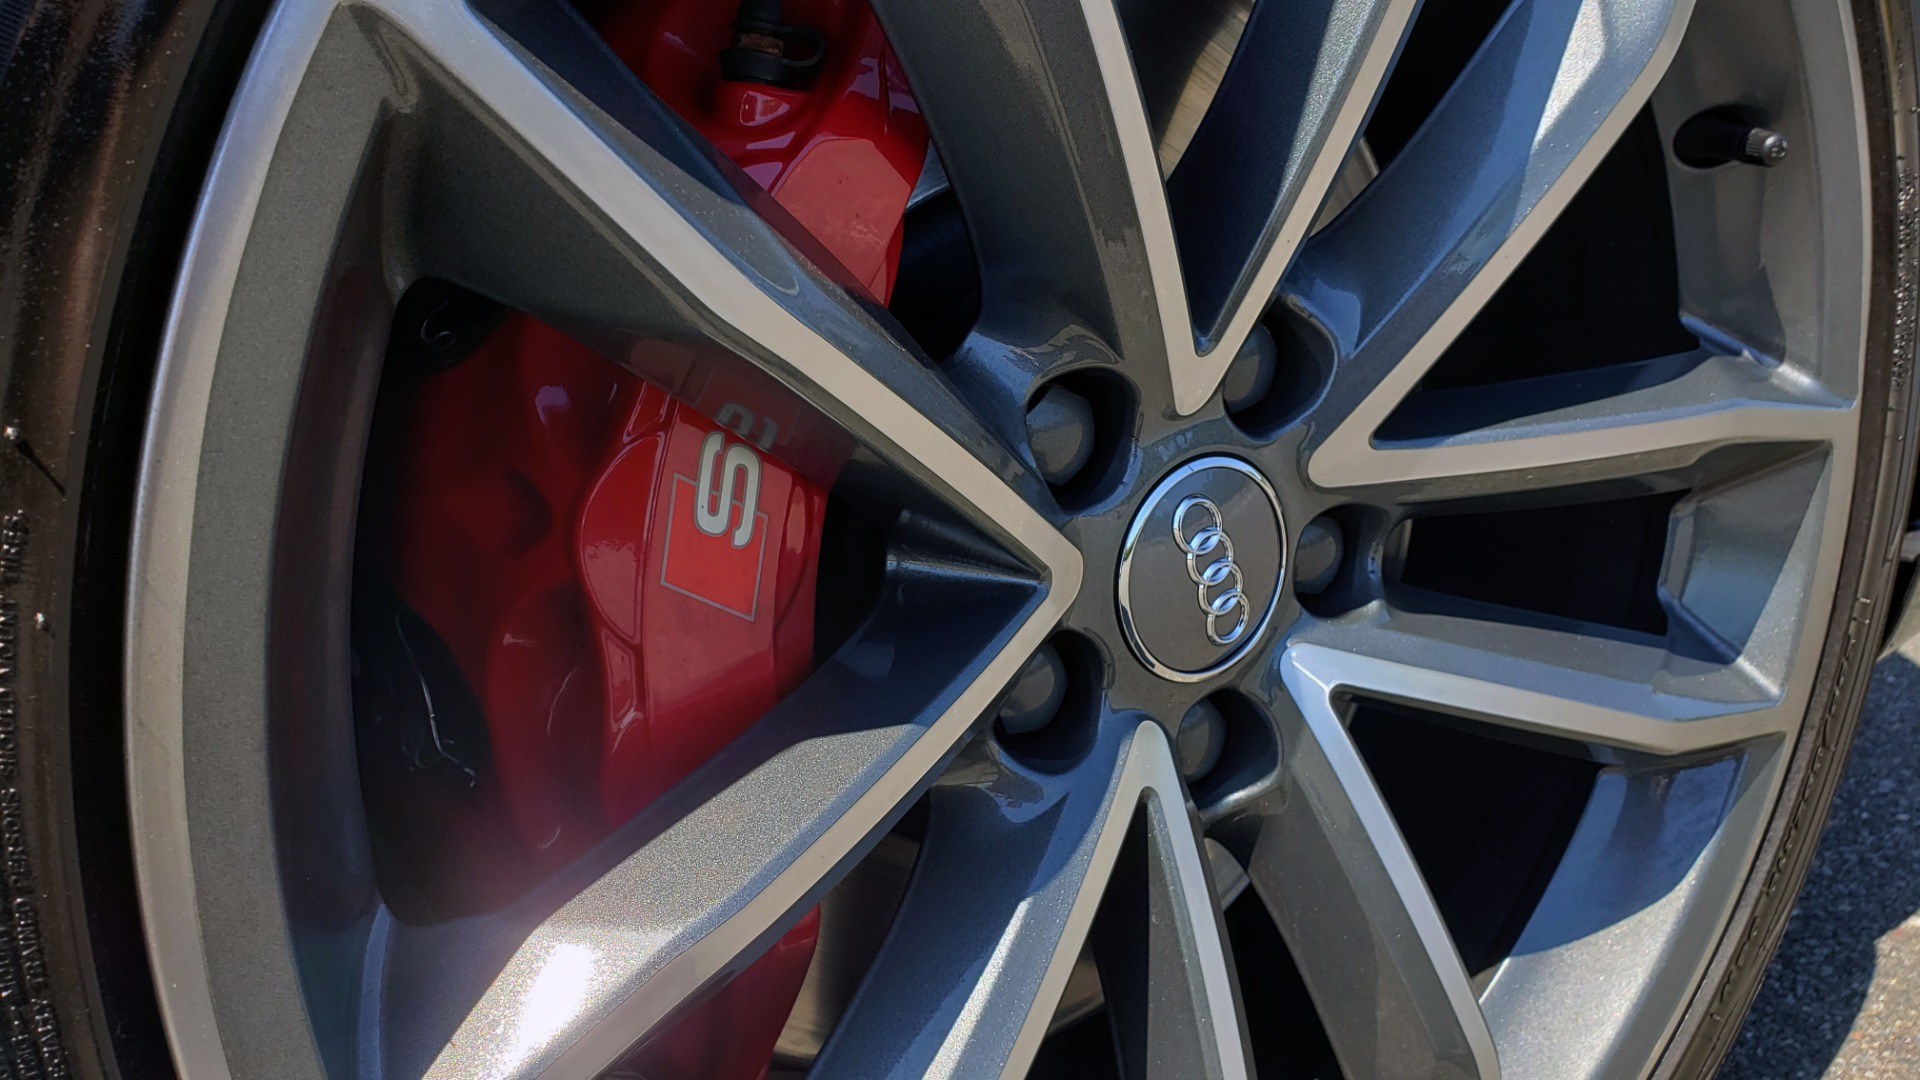 Used 2018 Audi S5 SPORTBACK PRESTIGE S-SPORT / NAV / SUNROOF / HUD / B&O SND / REARVIEW for sale $48,995 at Formula Imports in Charlotte NC 28227 76